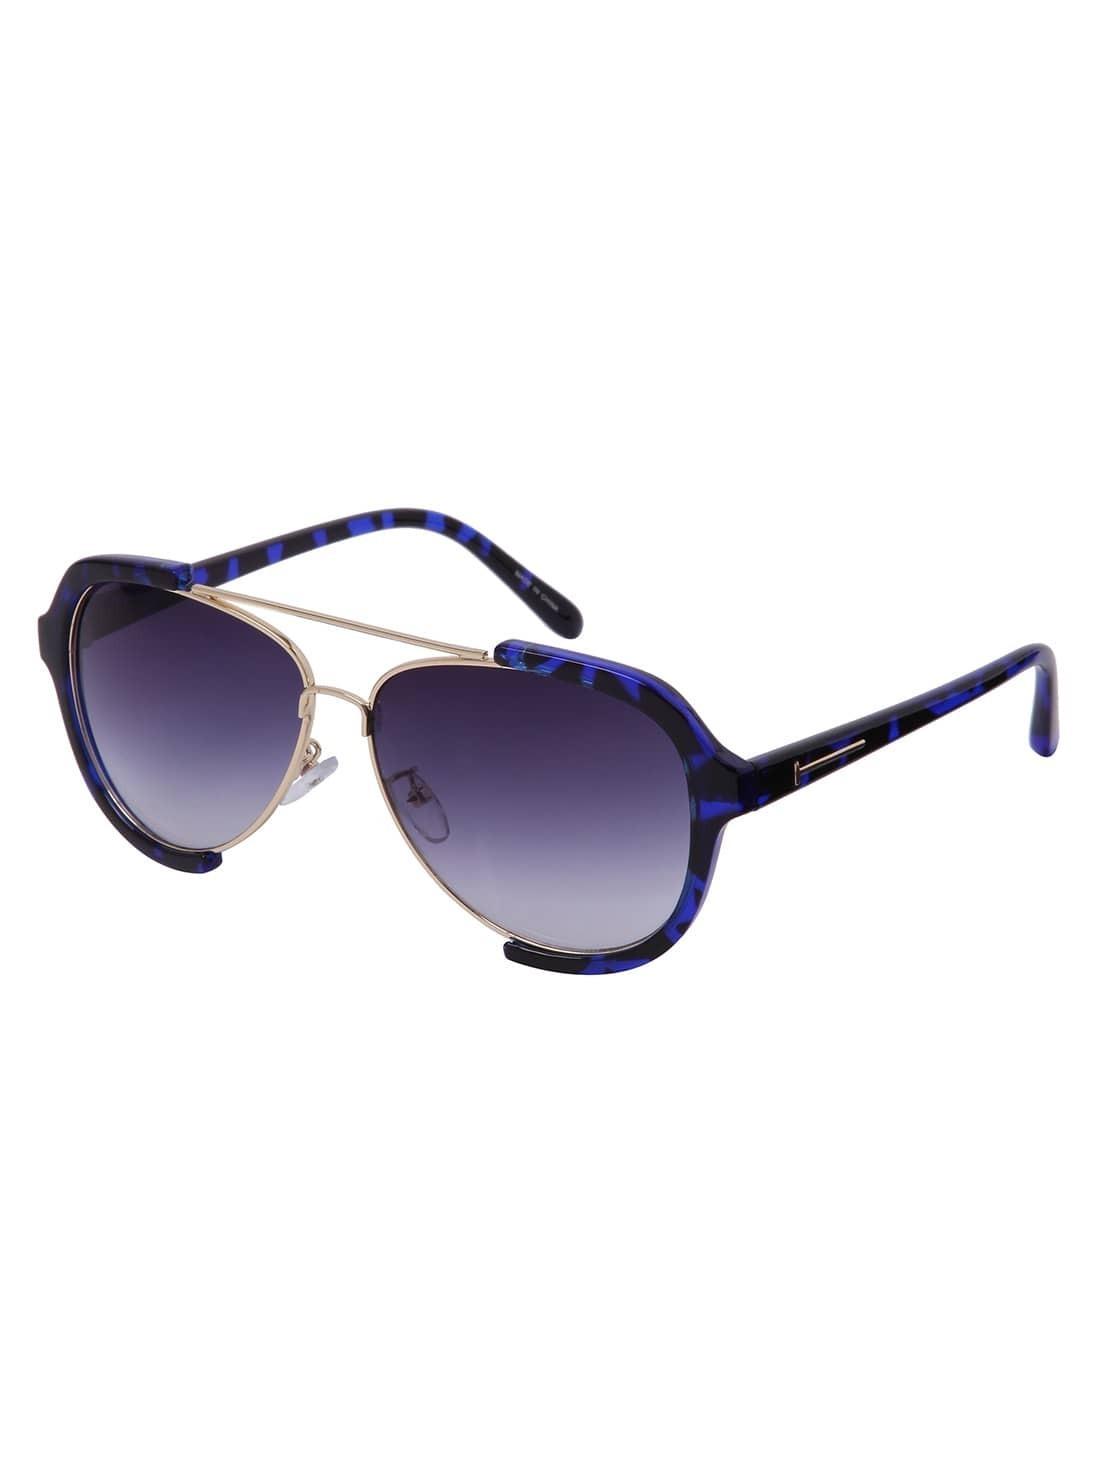 afcbc92098 Double Bridge Aviator Sunglasses